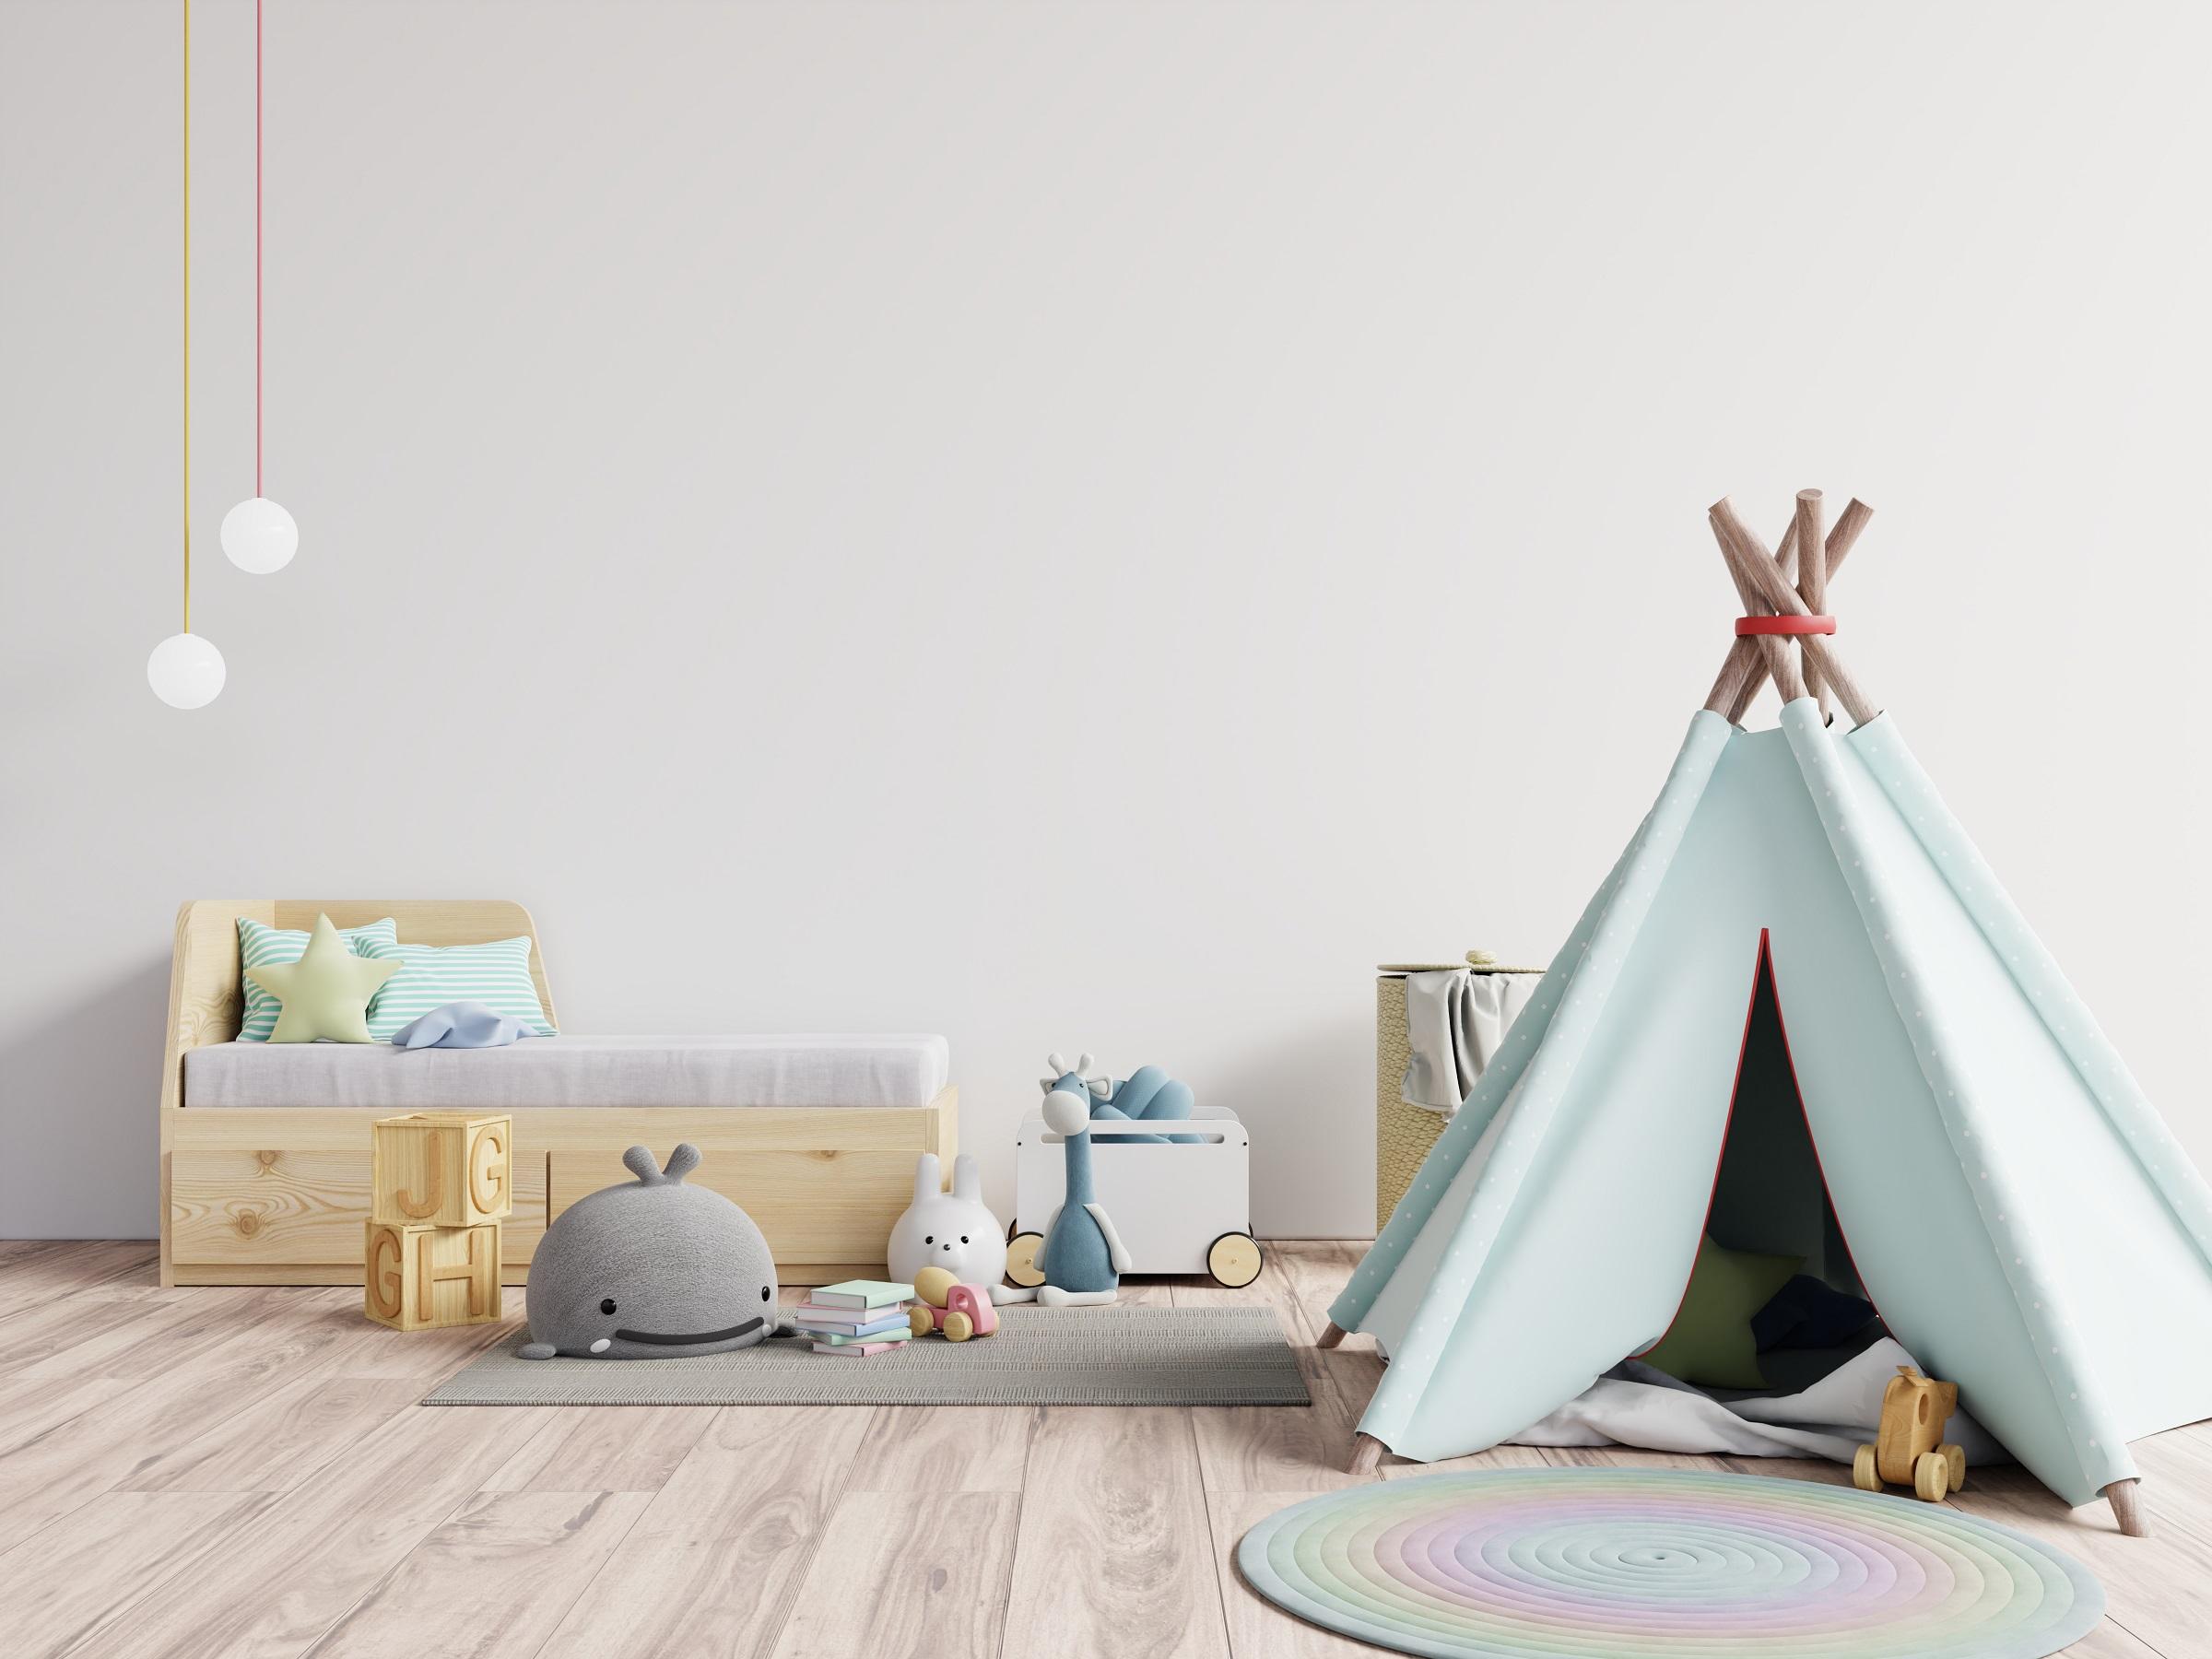 Children's room interior ideas: colors, decor and thematic design